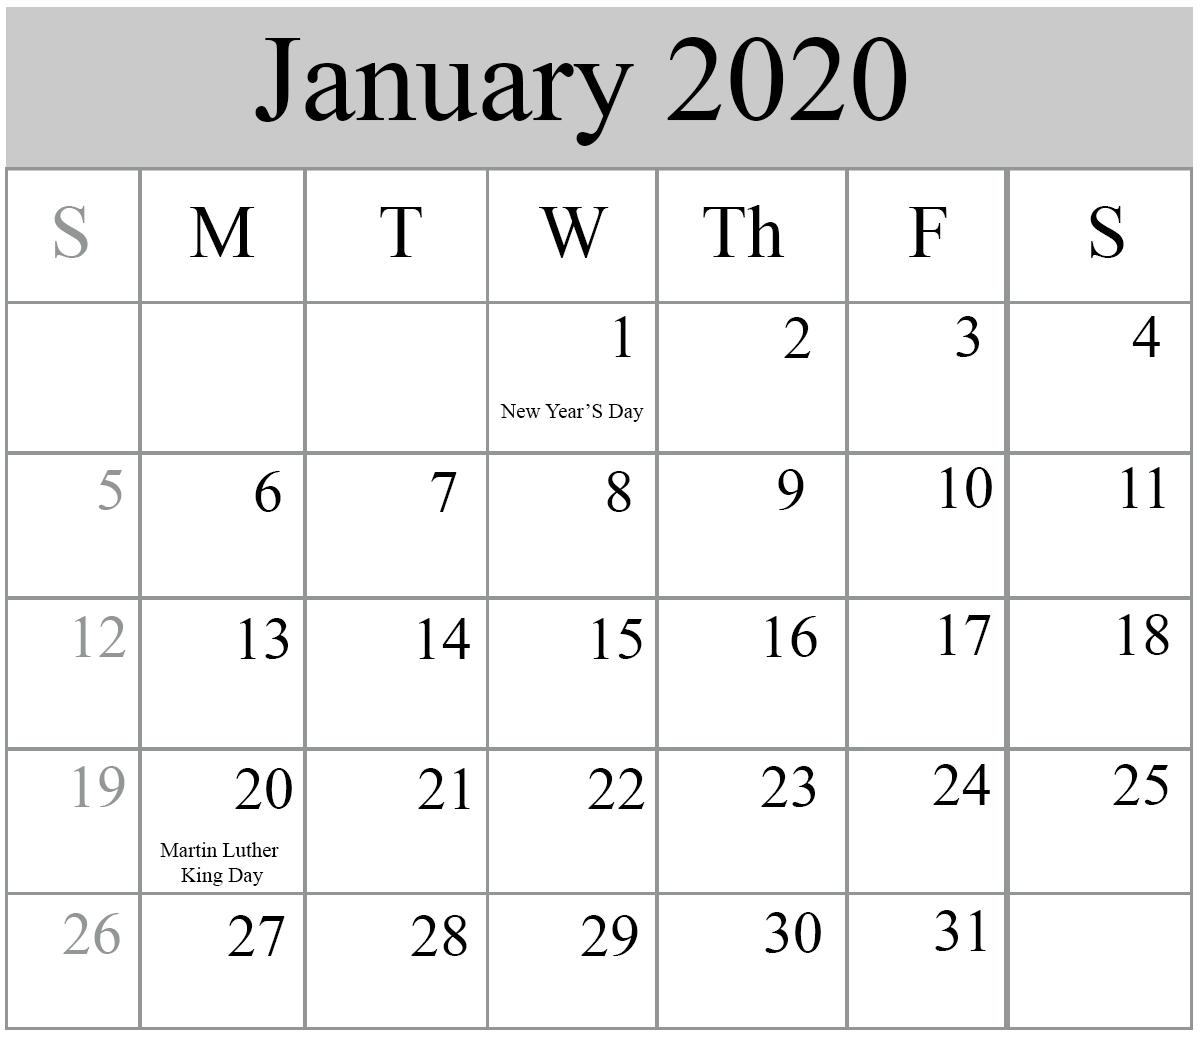 Free Blank January 2020 Calendar Printable In Pdf, Word-January 2020 Calendar New Zealand